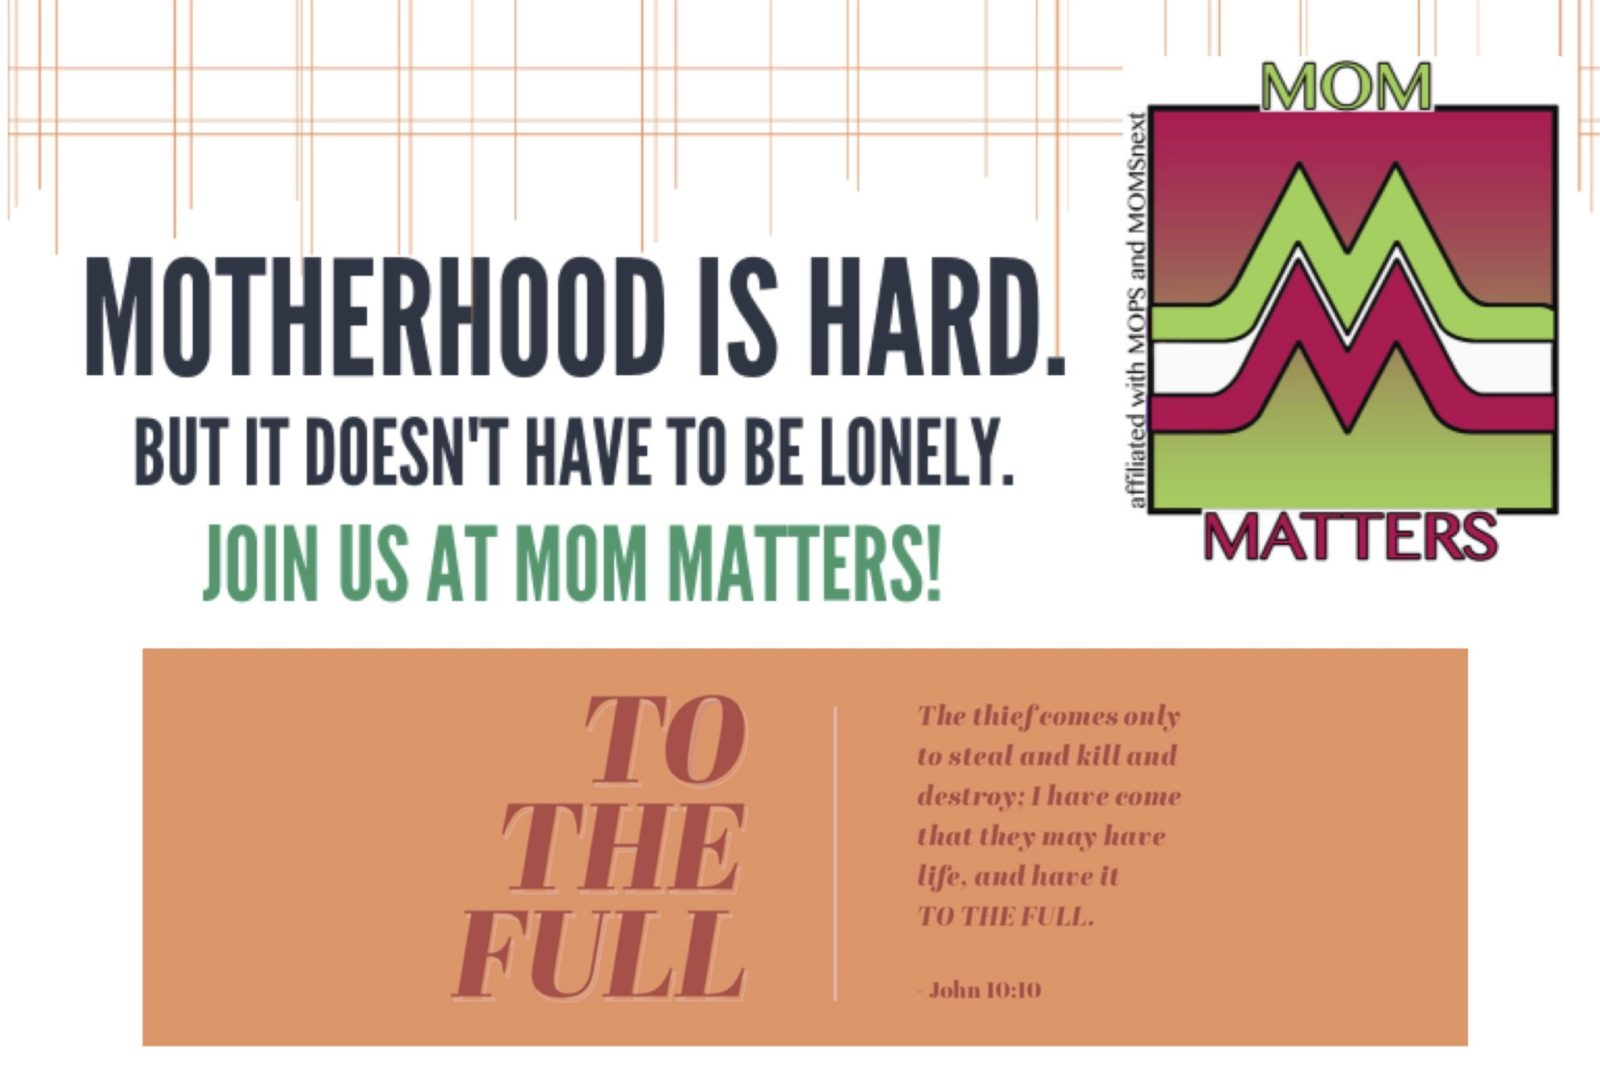 MOM MATTERS